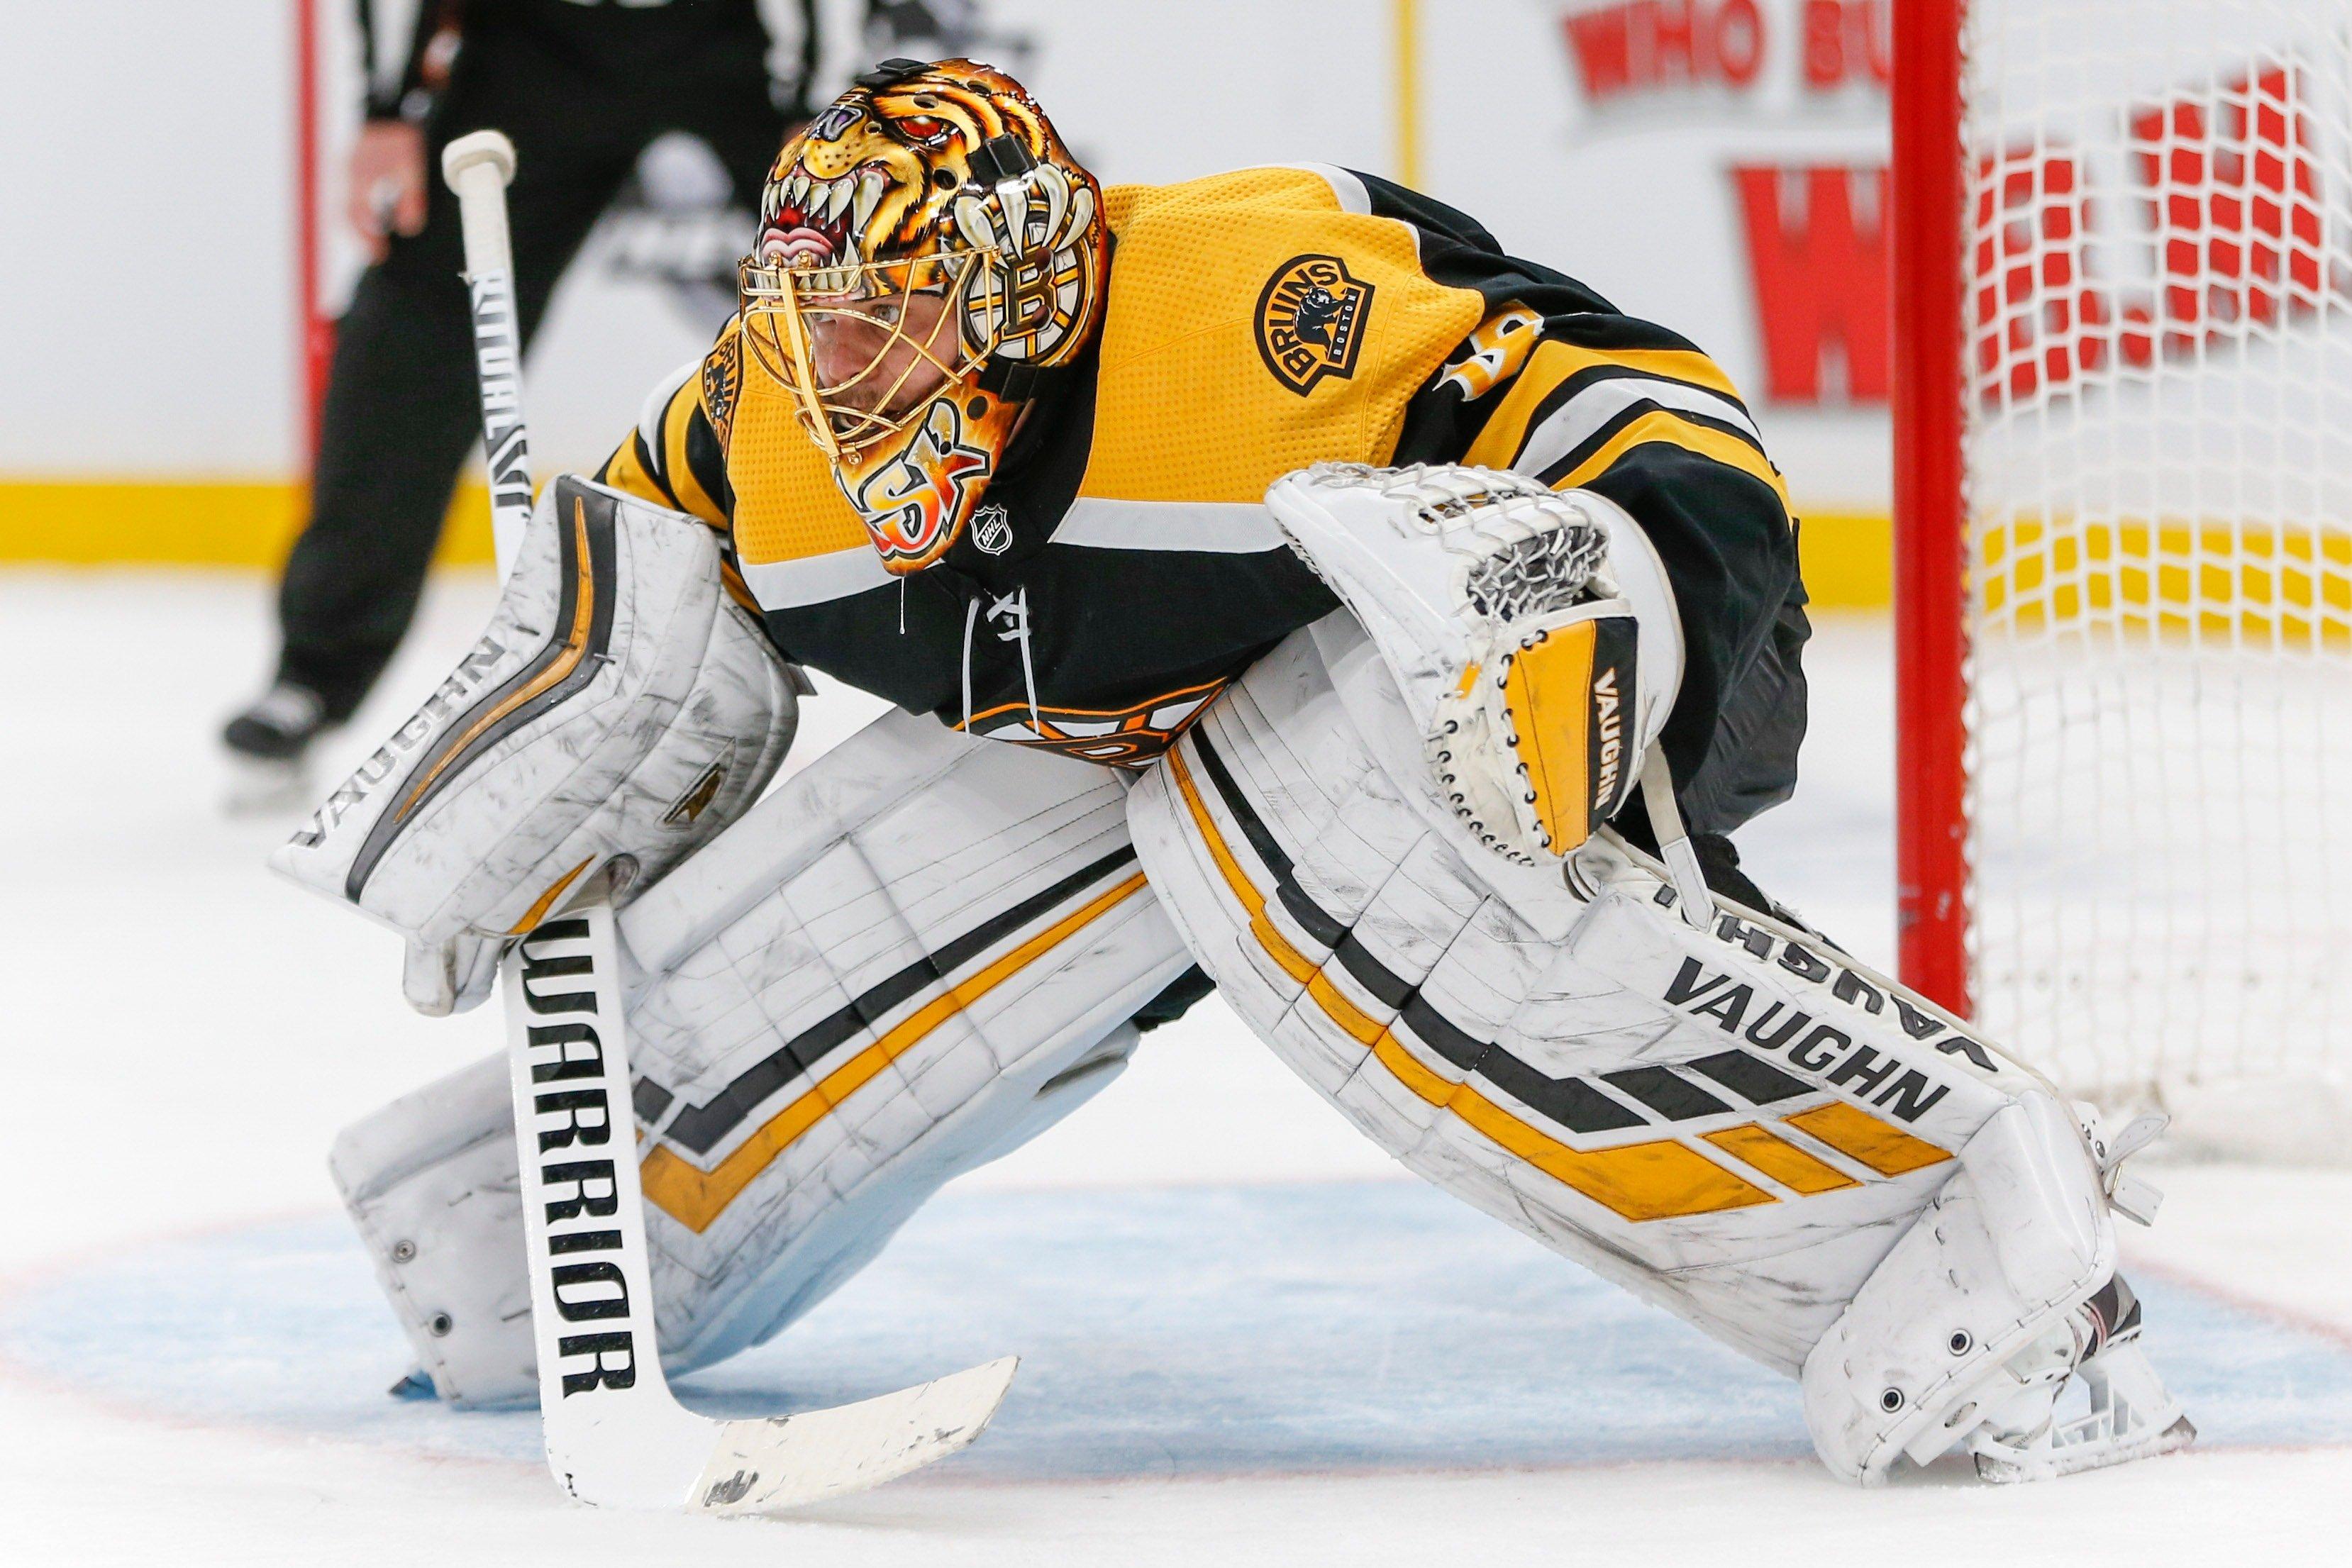 Bruins goalie Tuukka Rask placed on injured reserve